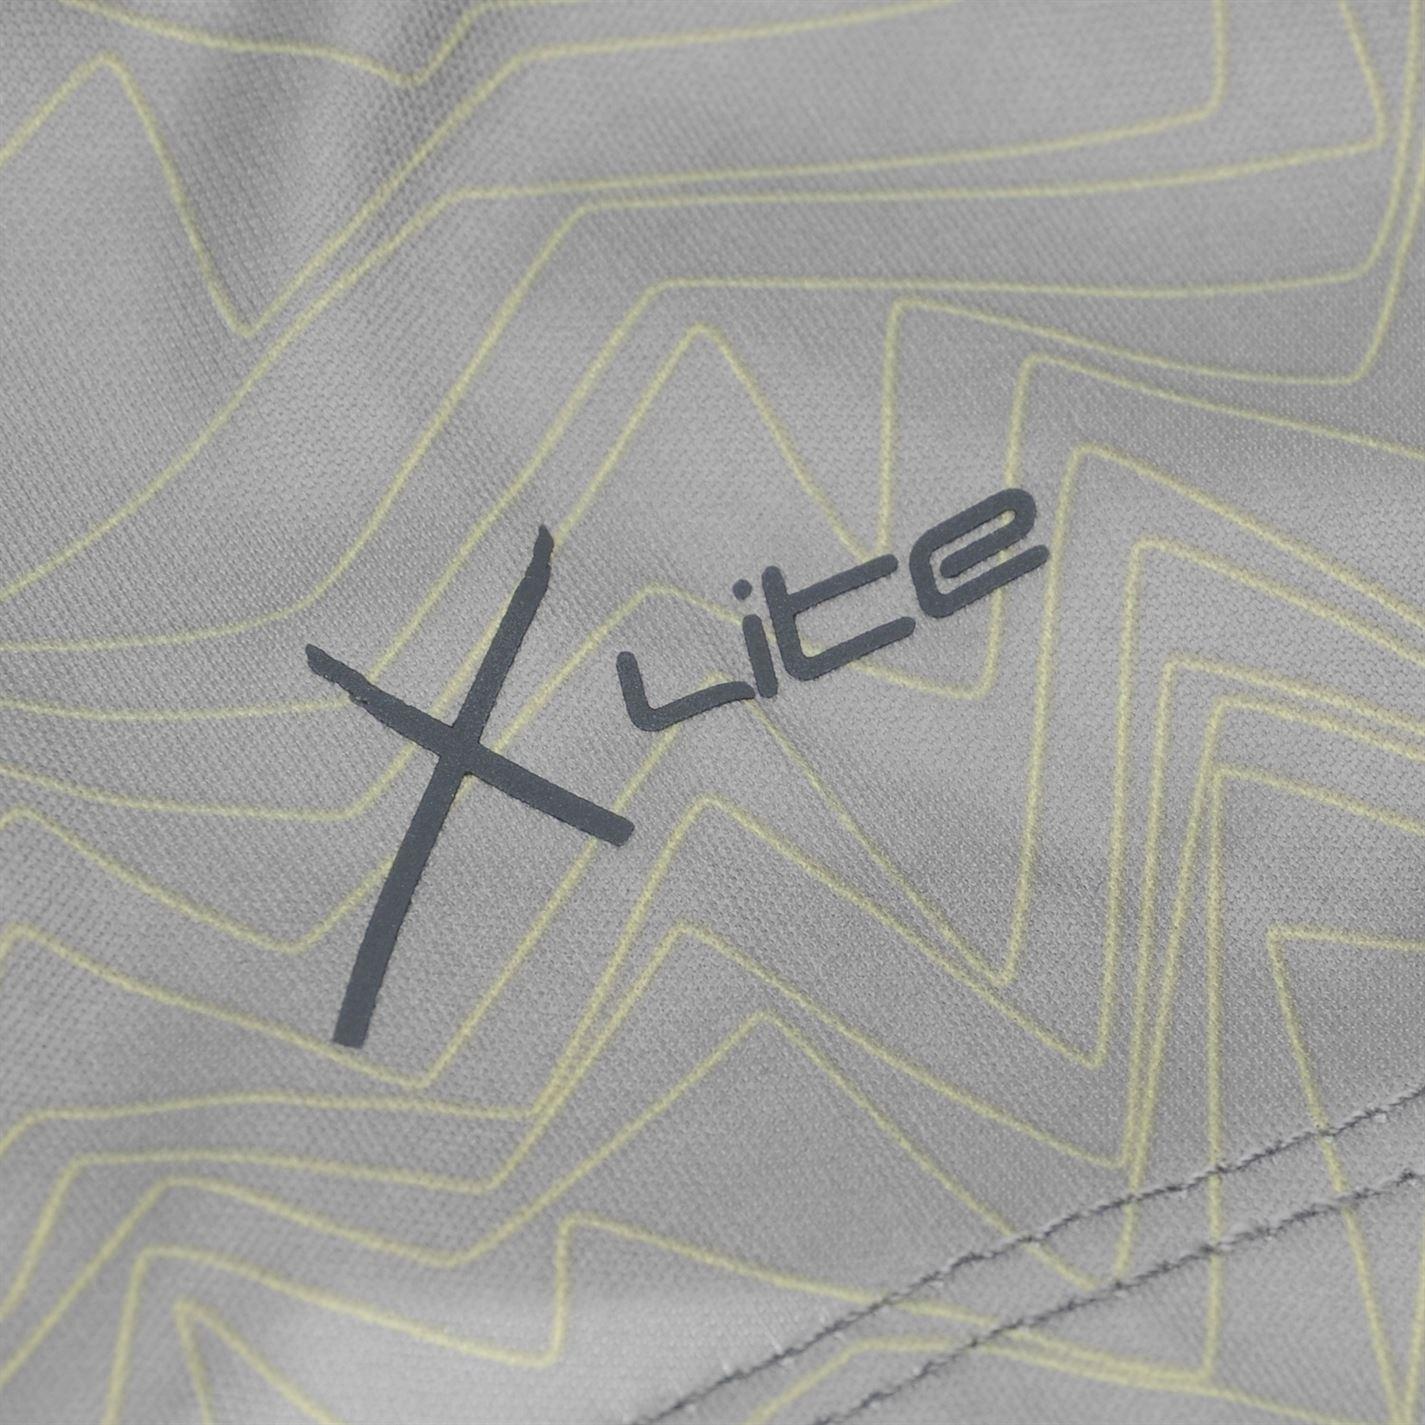 Karrimor-Hombres-X-Lite-Camiseta-mangas-cortas-de-carrera-Rendimiento-Camiseta-Top-Cuello-Redondo miniatura 10